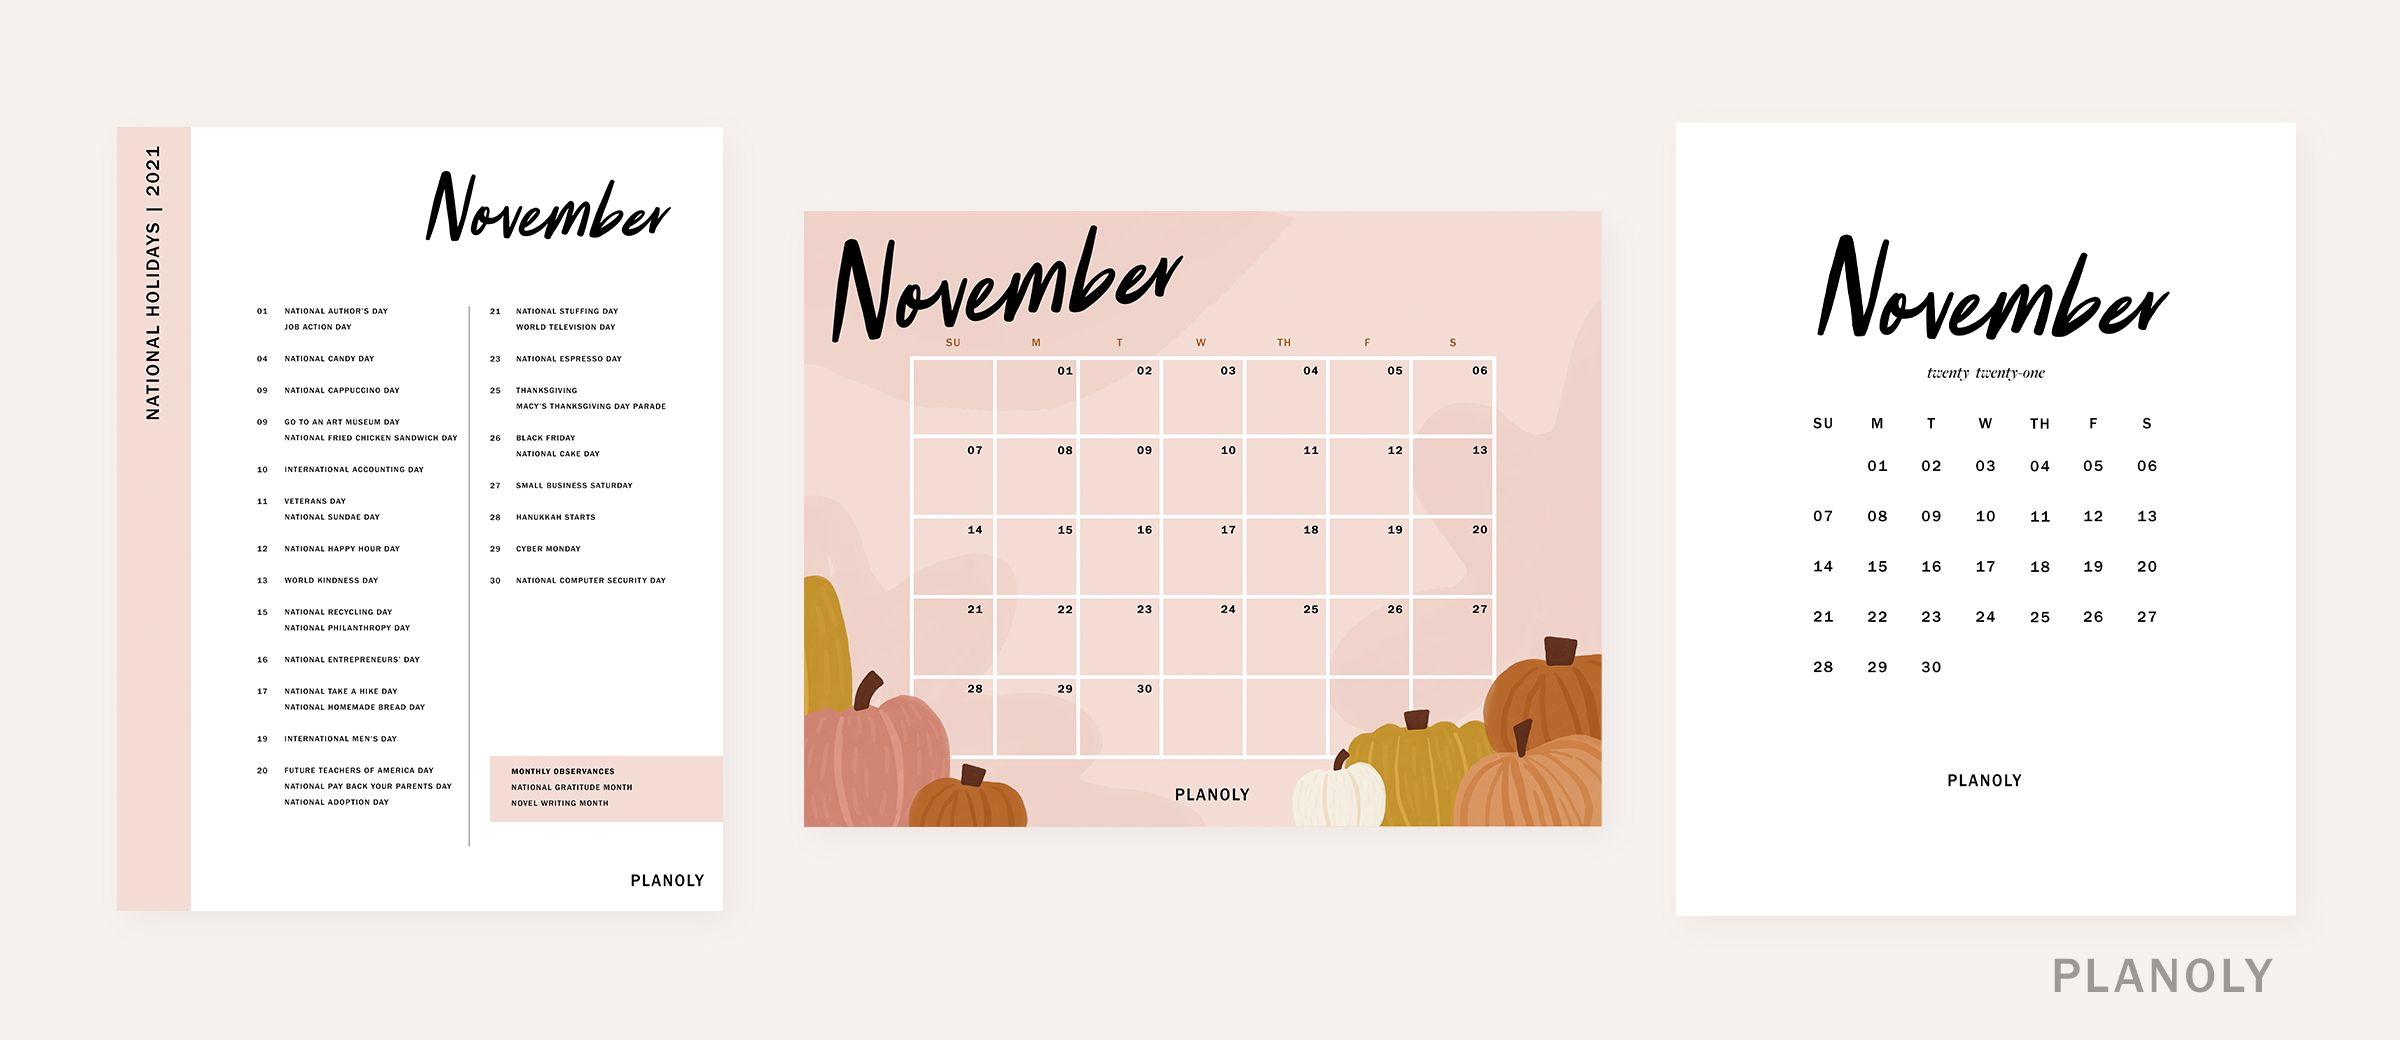 PLANOLY-Q4 Content Calendars-Image 2